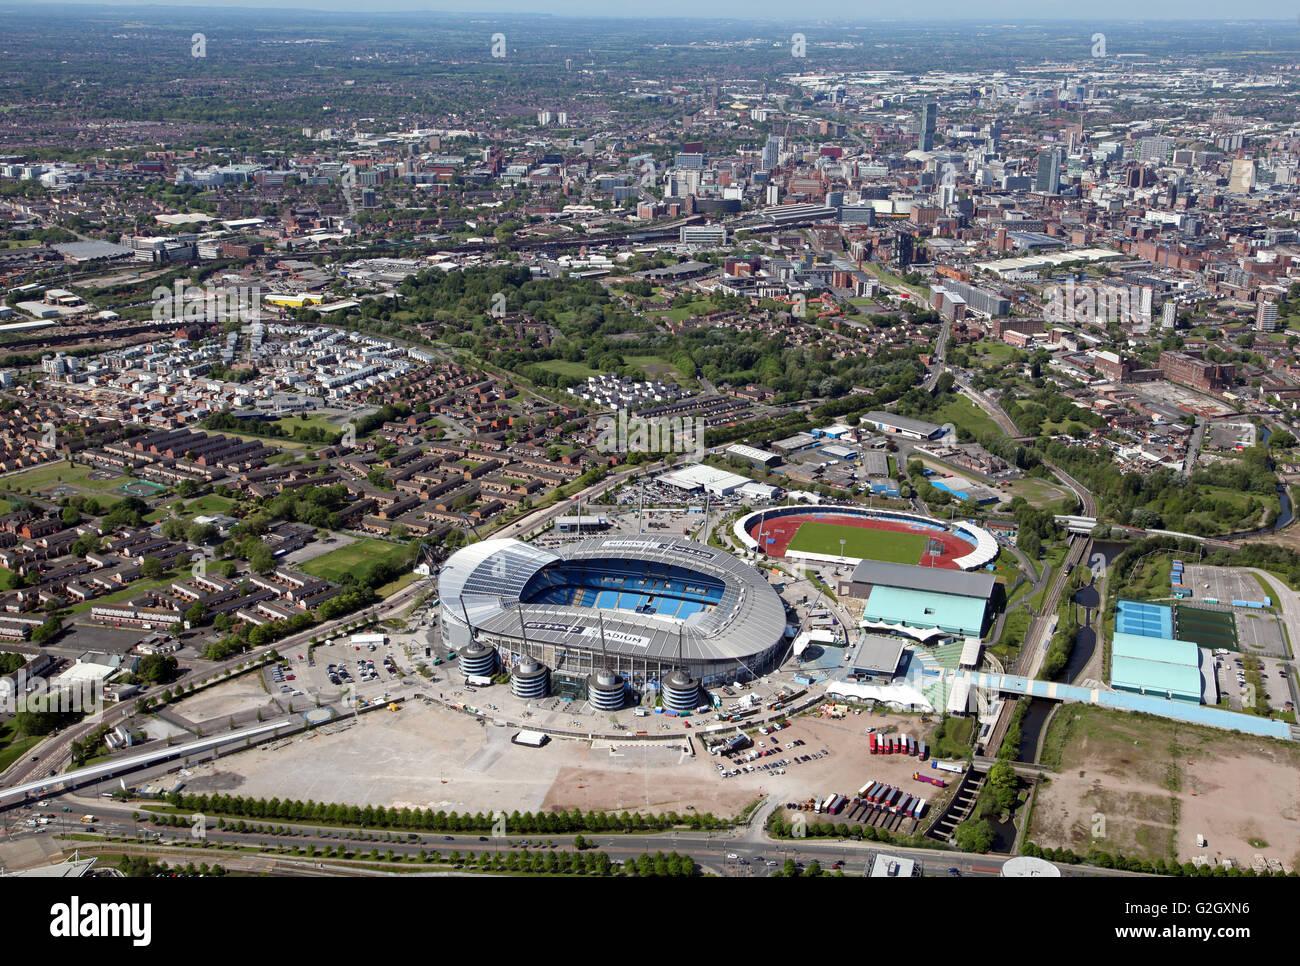 Luftaufnahme von Manchester City Football Academy, Etihad Stadium & Manchester Regional Centre, UK Stockbild